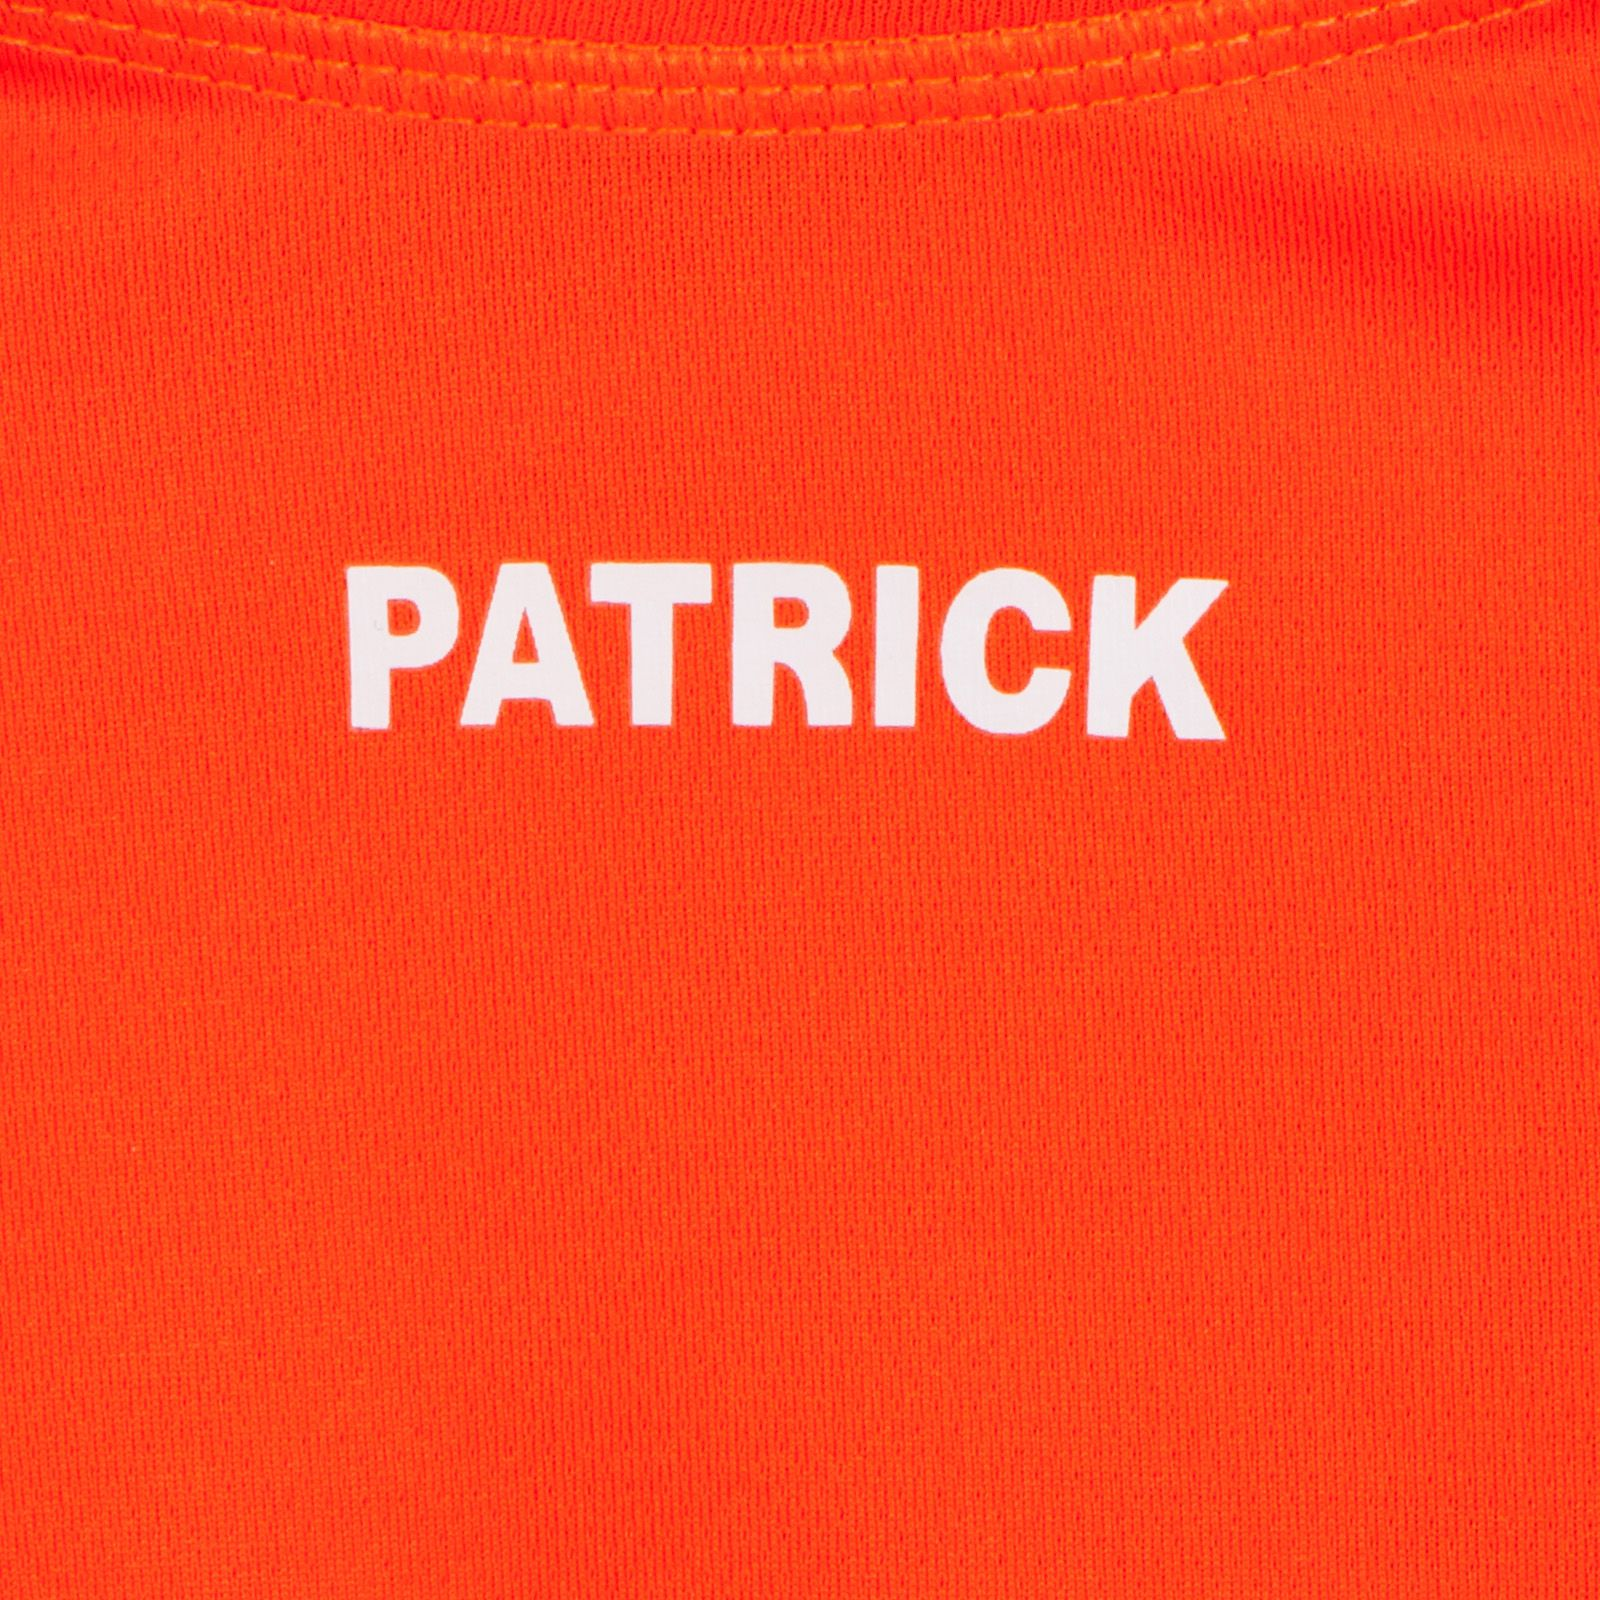 Футболка Patrick - Бельгия